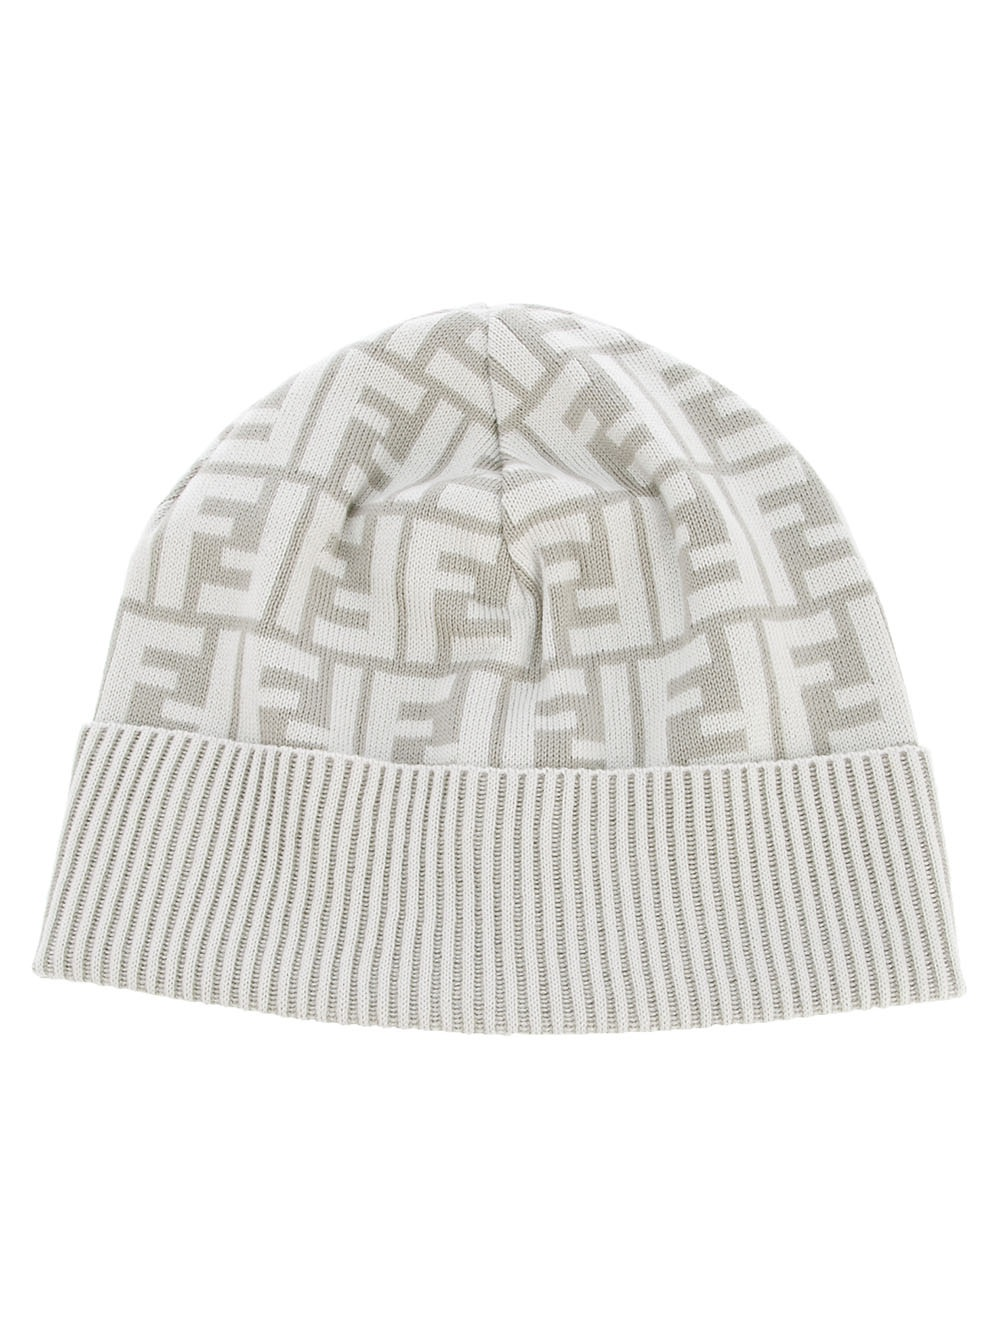 Fendi Monogram Hat in Gray for Men - Lyst 1a6f10a91c9